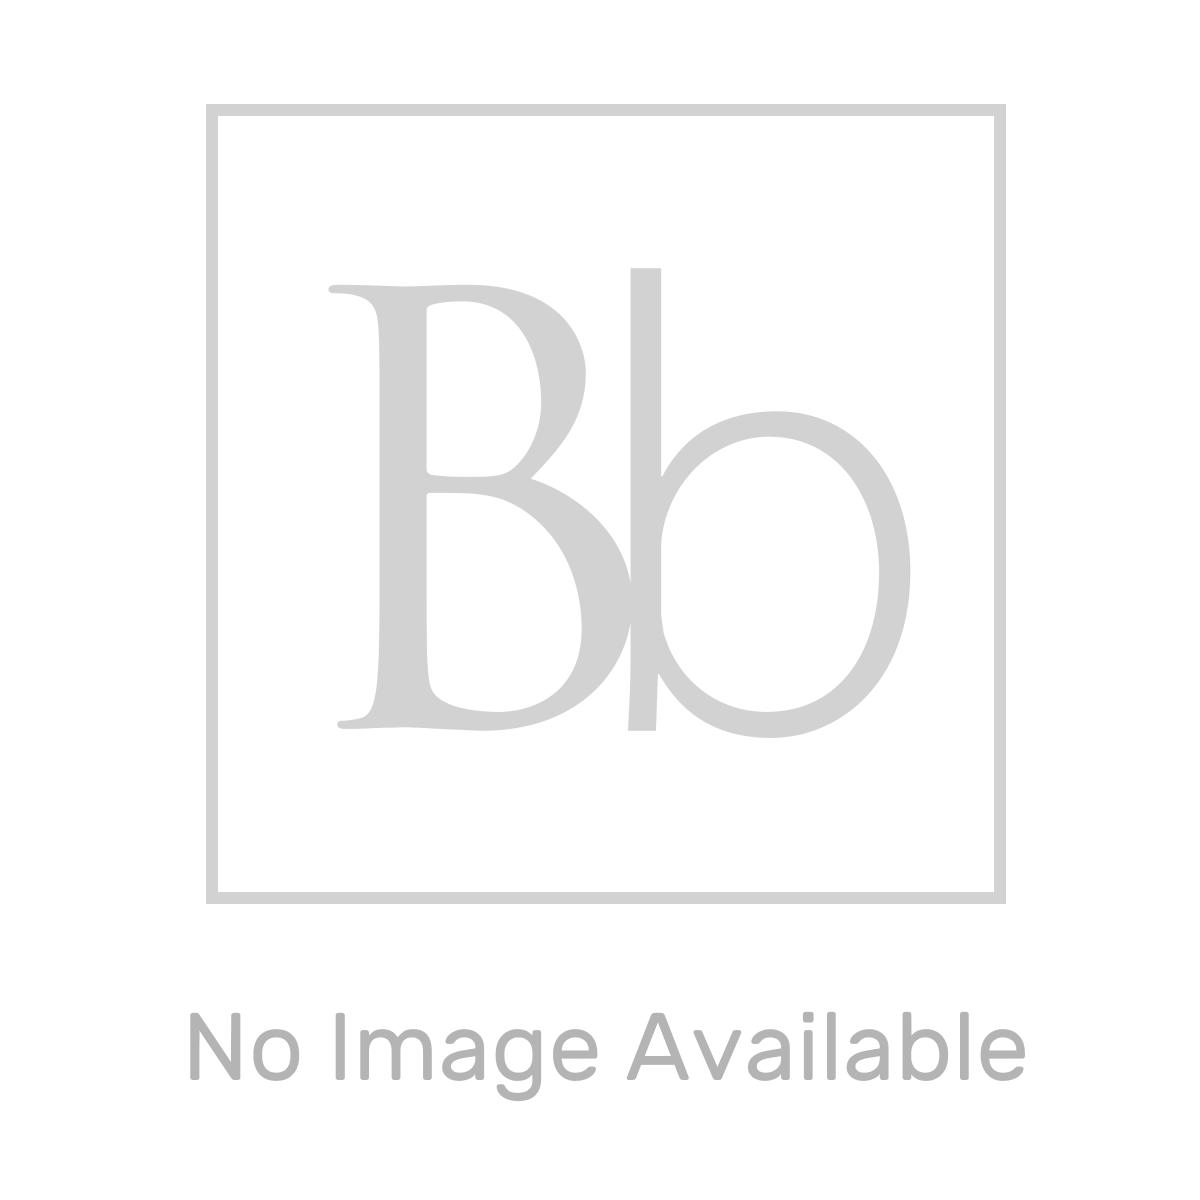 RAK Curve Black Mono Basin Mixer Tap with Waste Measurements